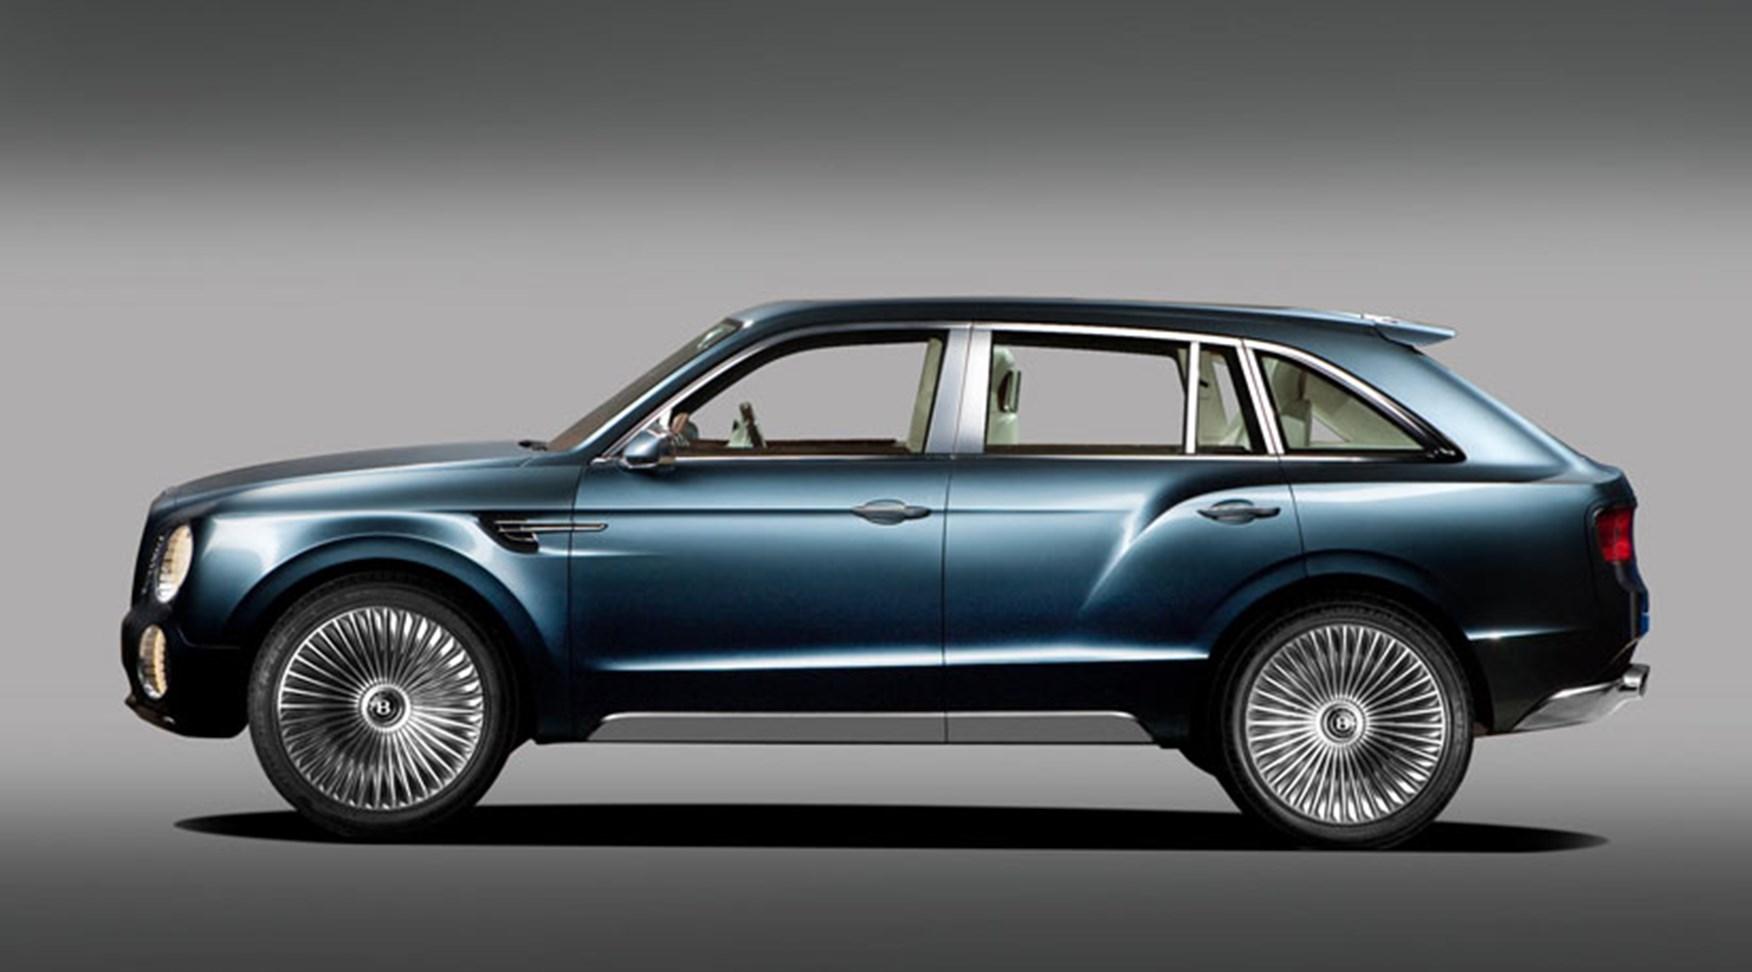 Bentley Suv 2016 New Spy Photos Of Poshest 4x4 Yet By